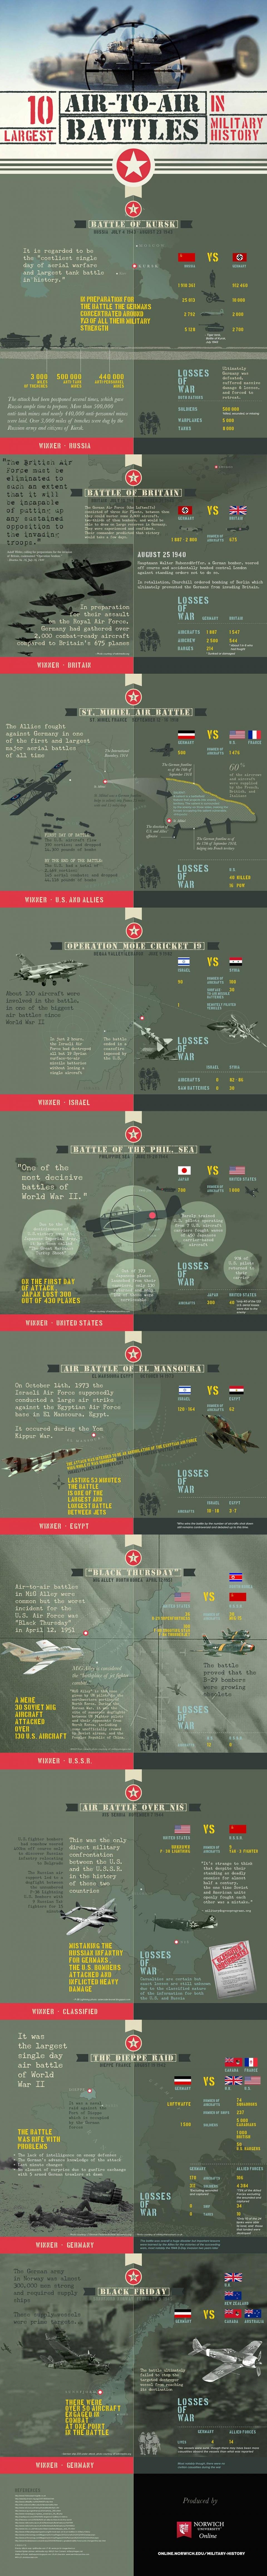 ten largest air battles infographic image